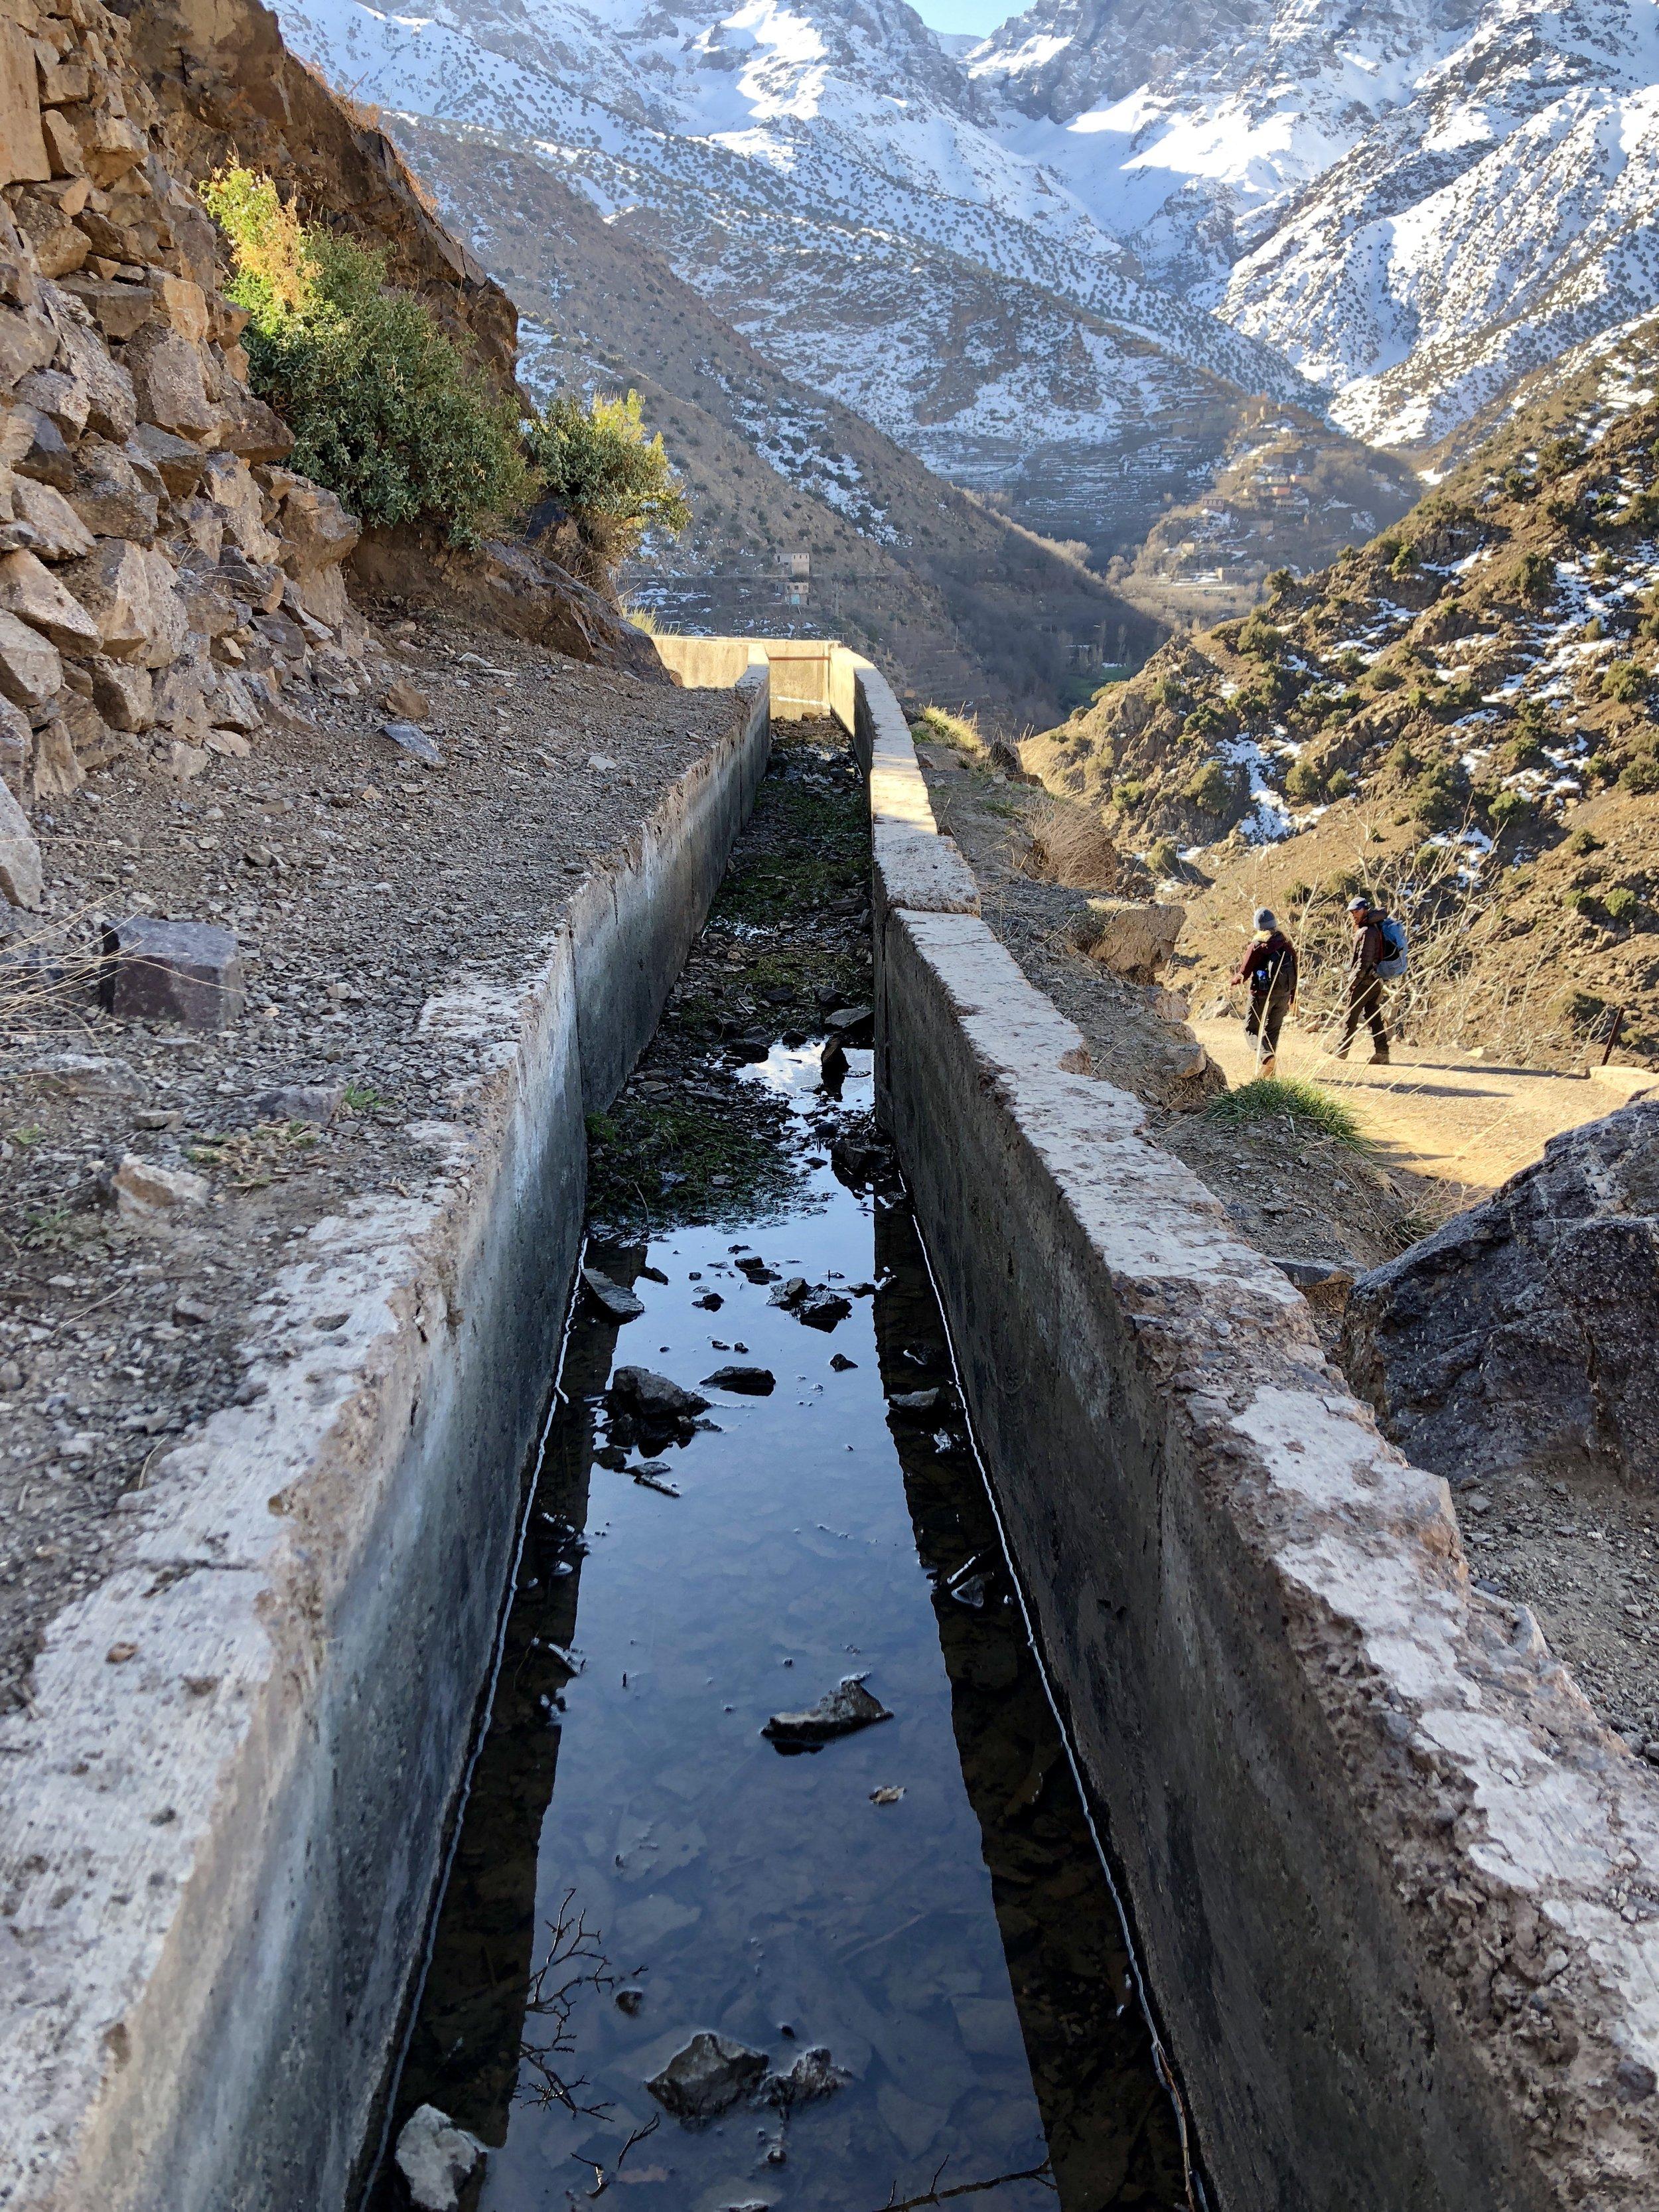 Irrigation channel.